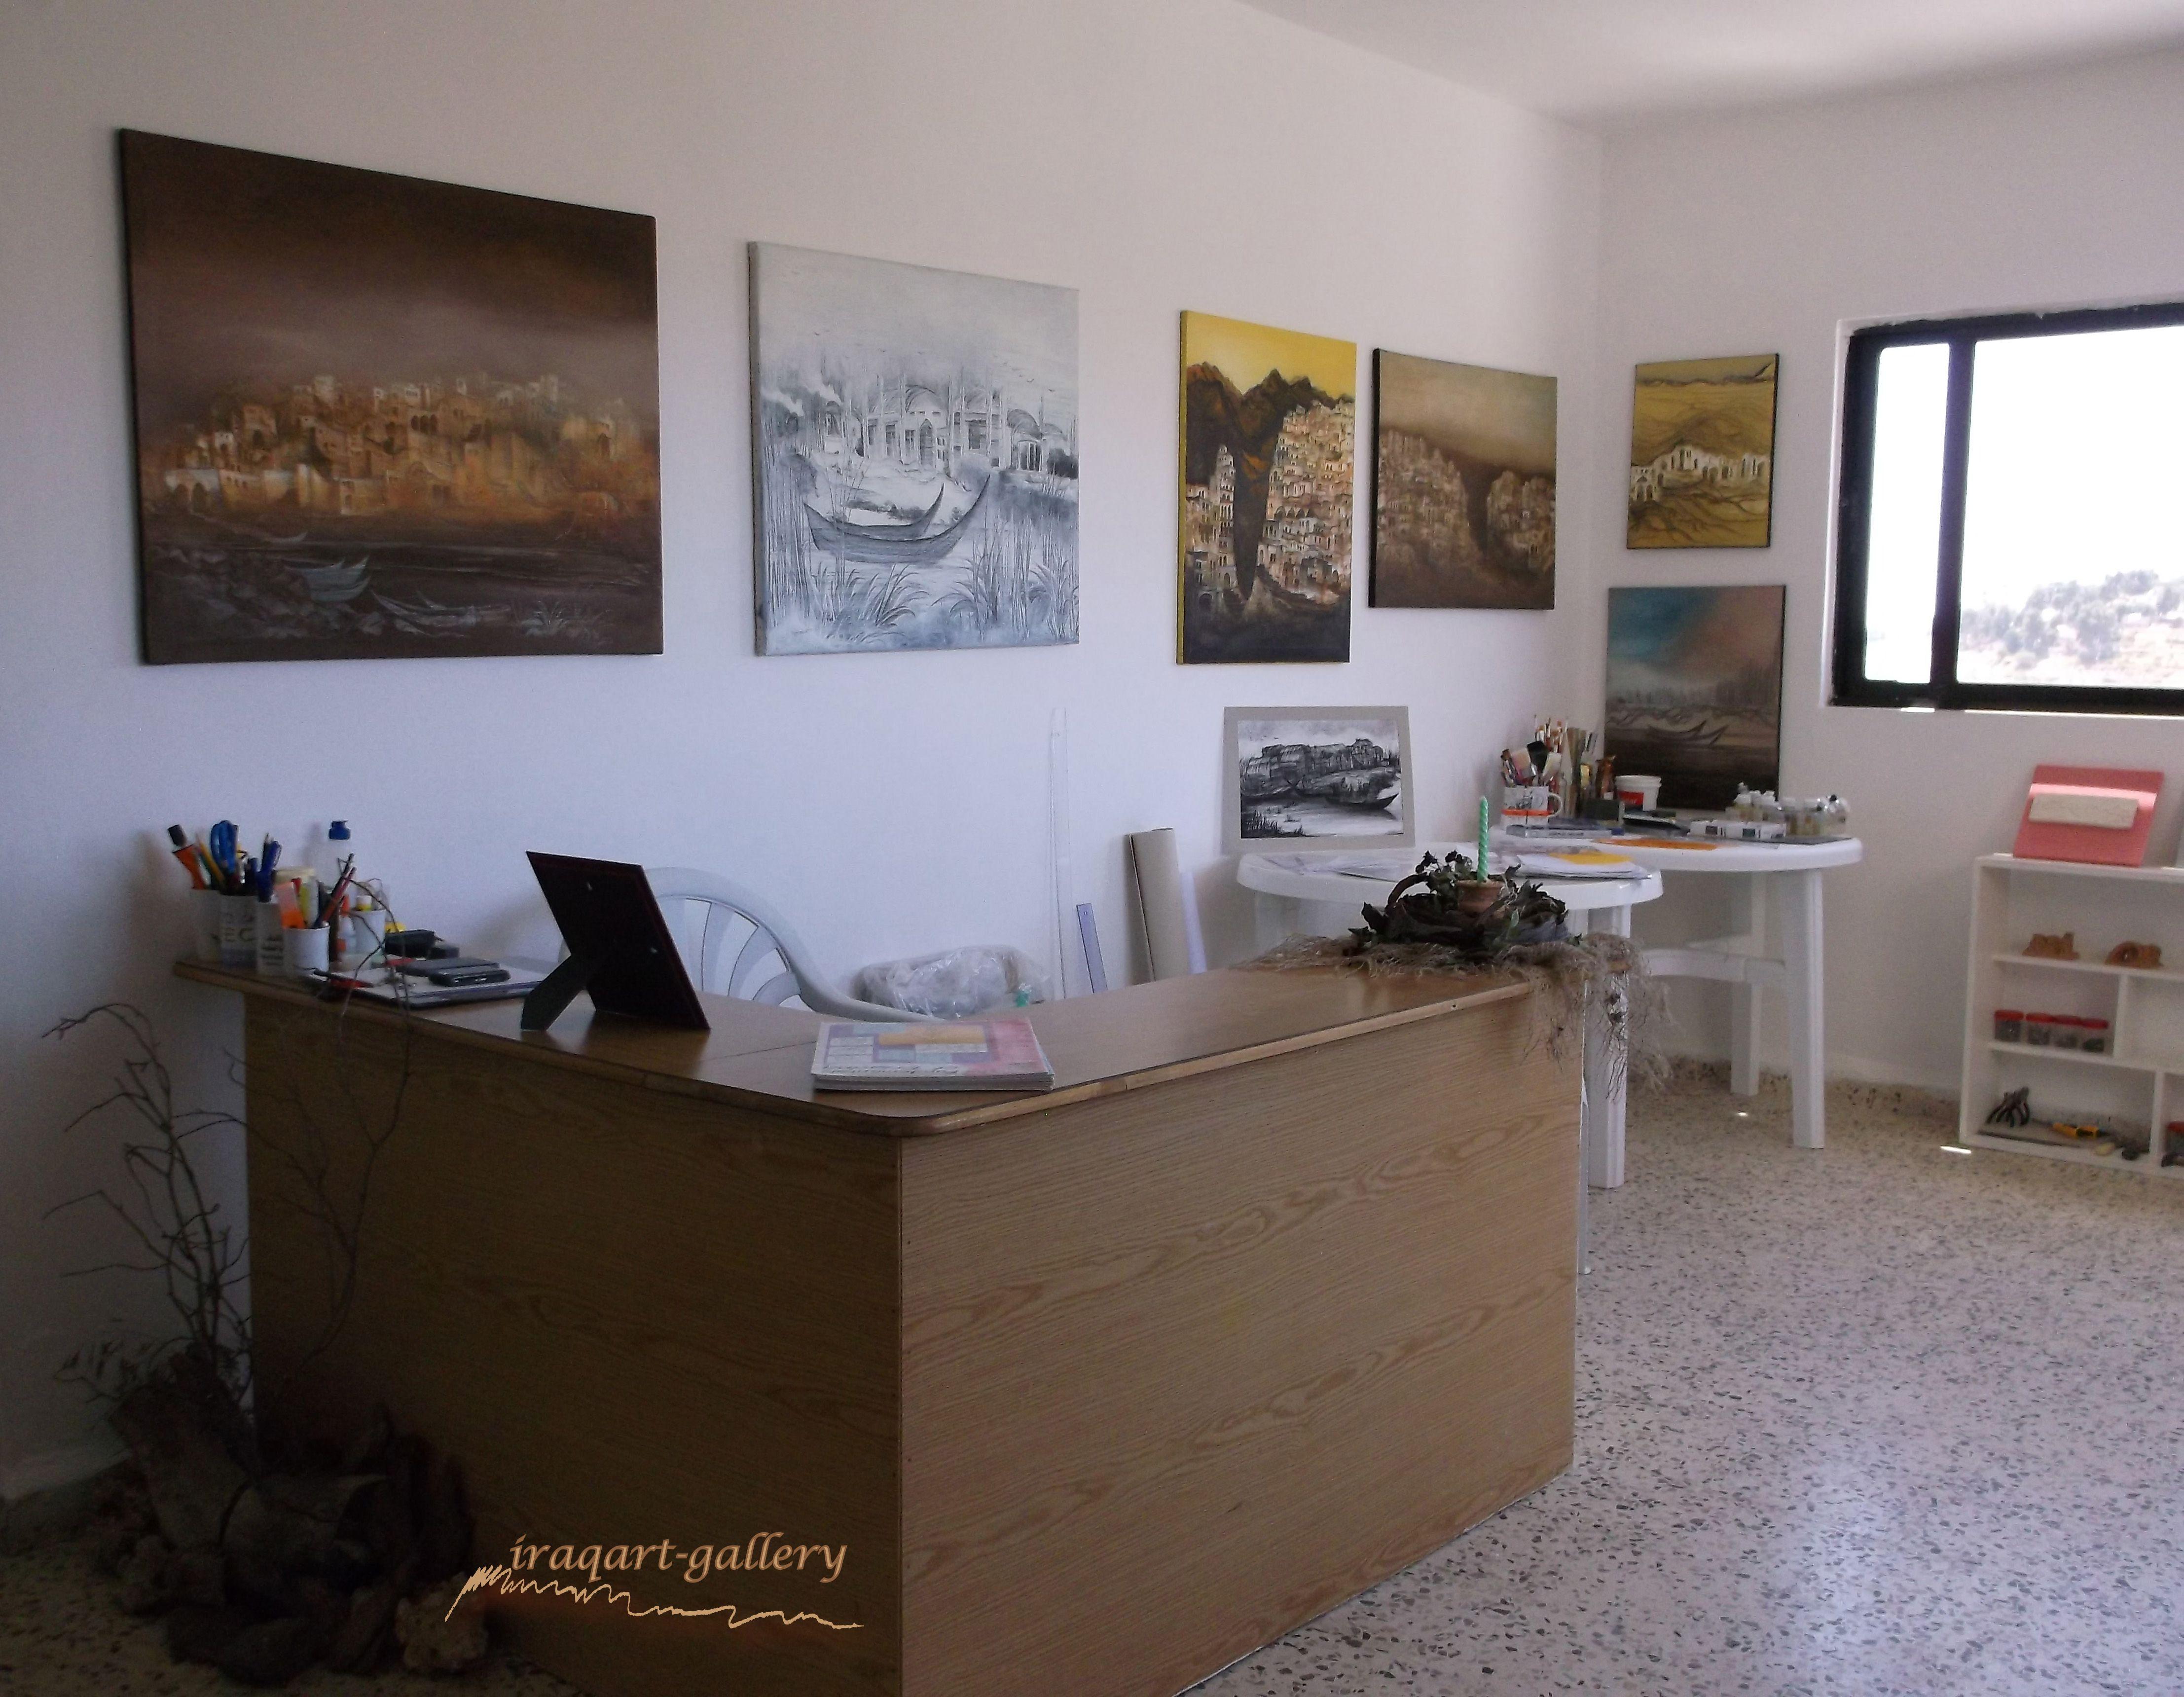 1-Art gallery -View